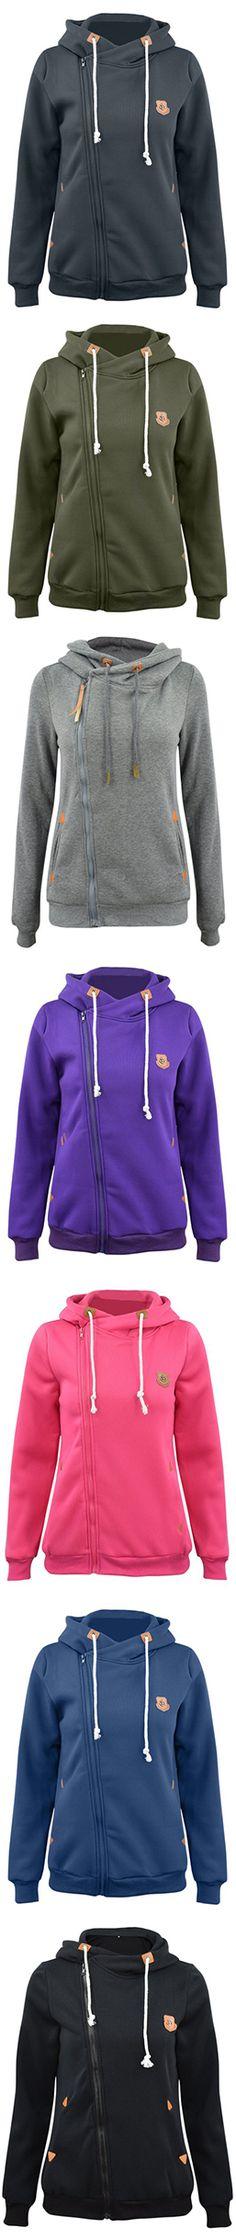 Fashion Turtleneck Oblique Zip Drawstring Hooded Sweatshirt